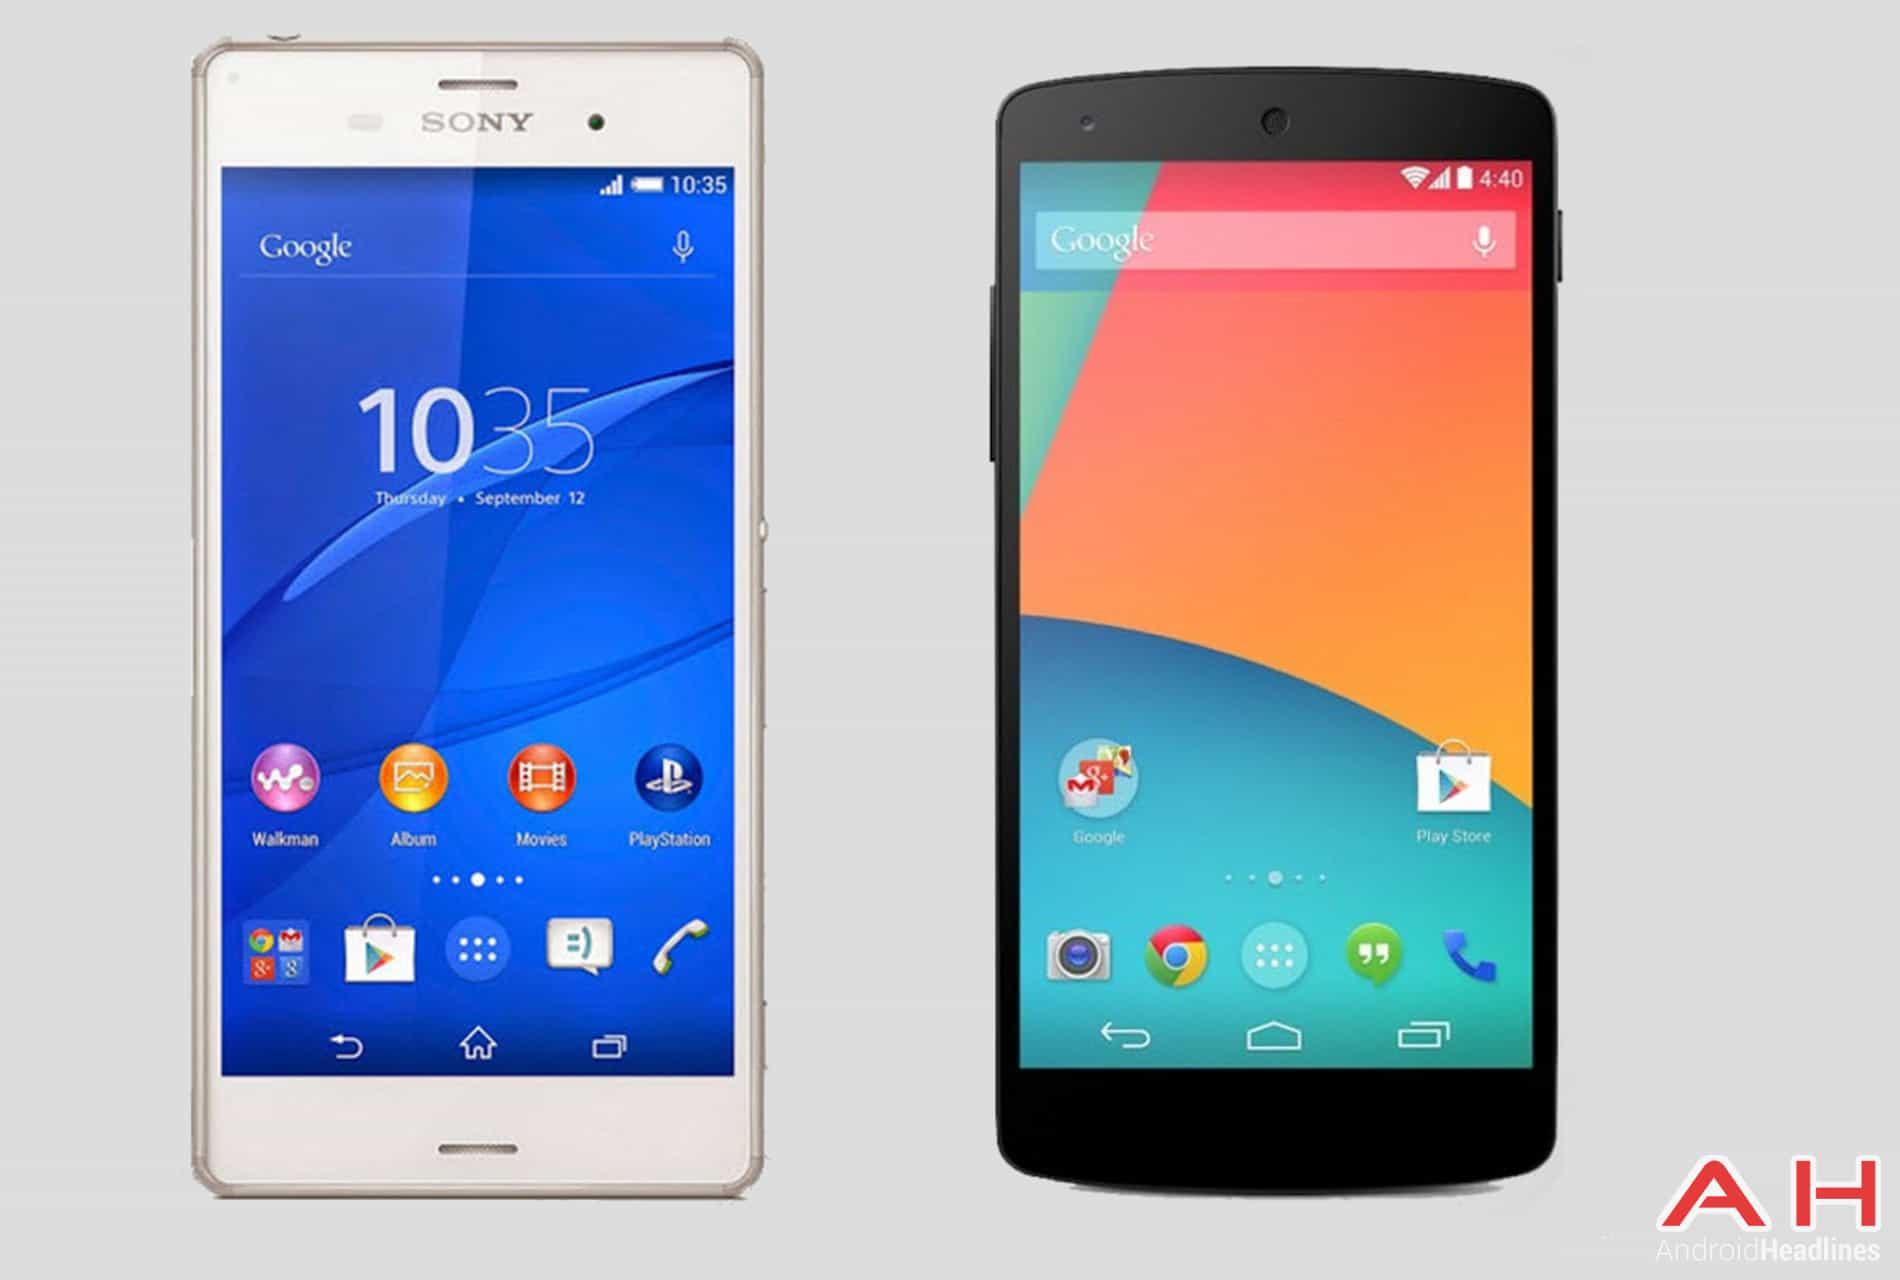 Xperia Z3 vs Nexus 5 AH